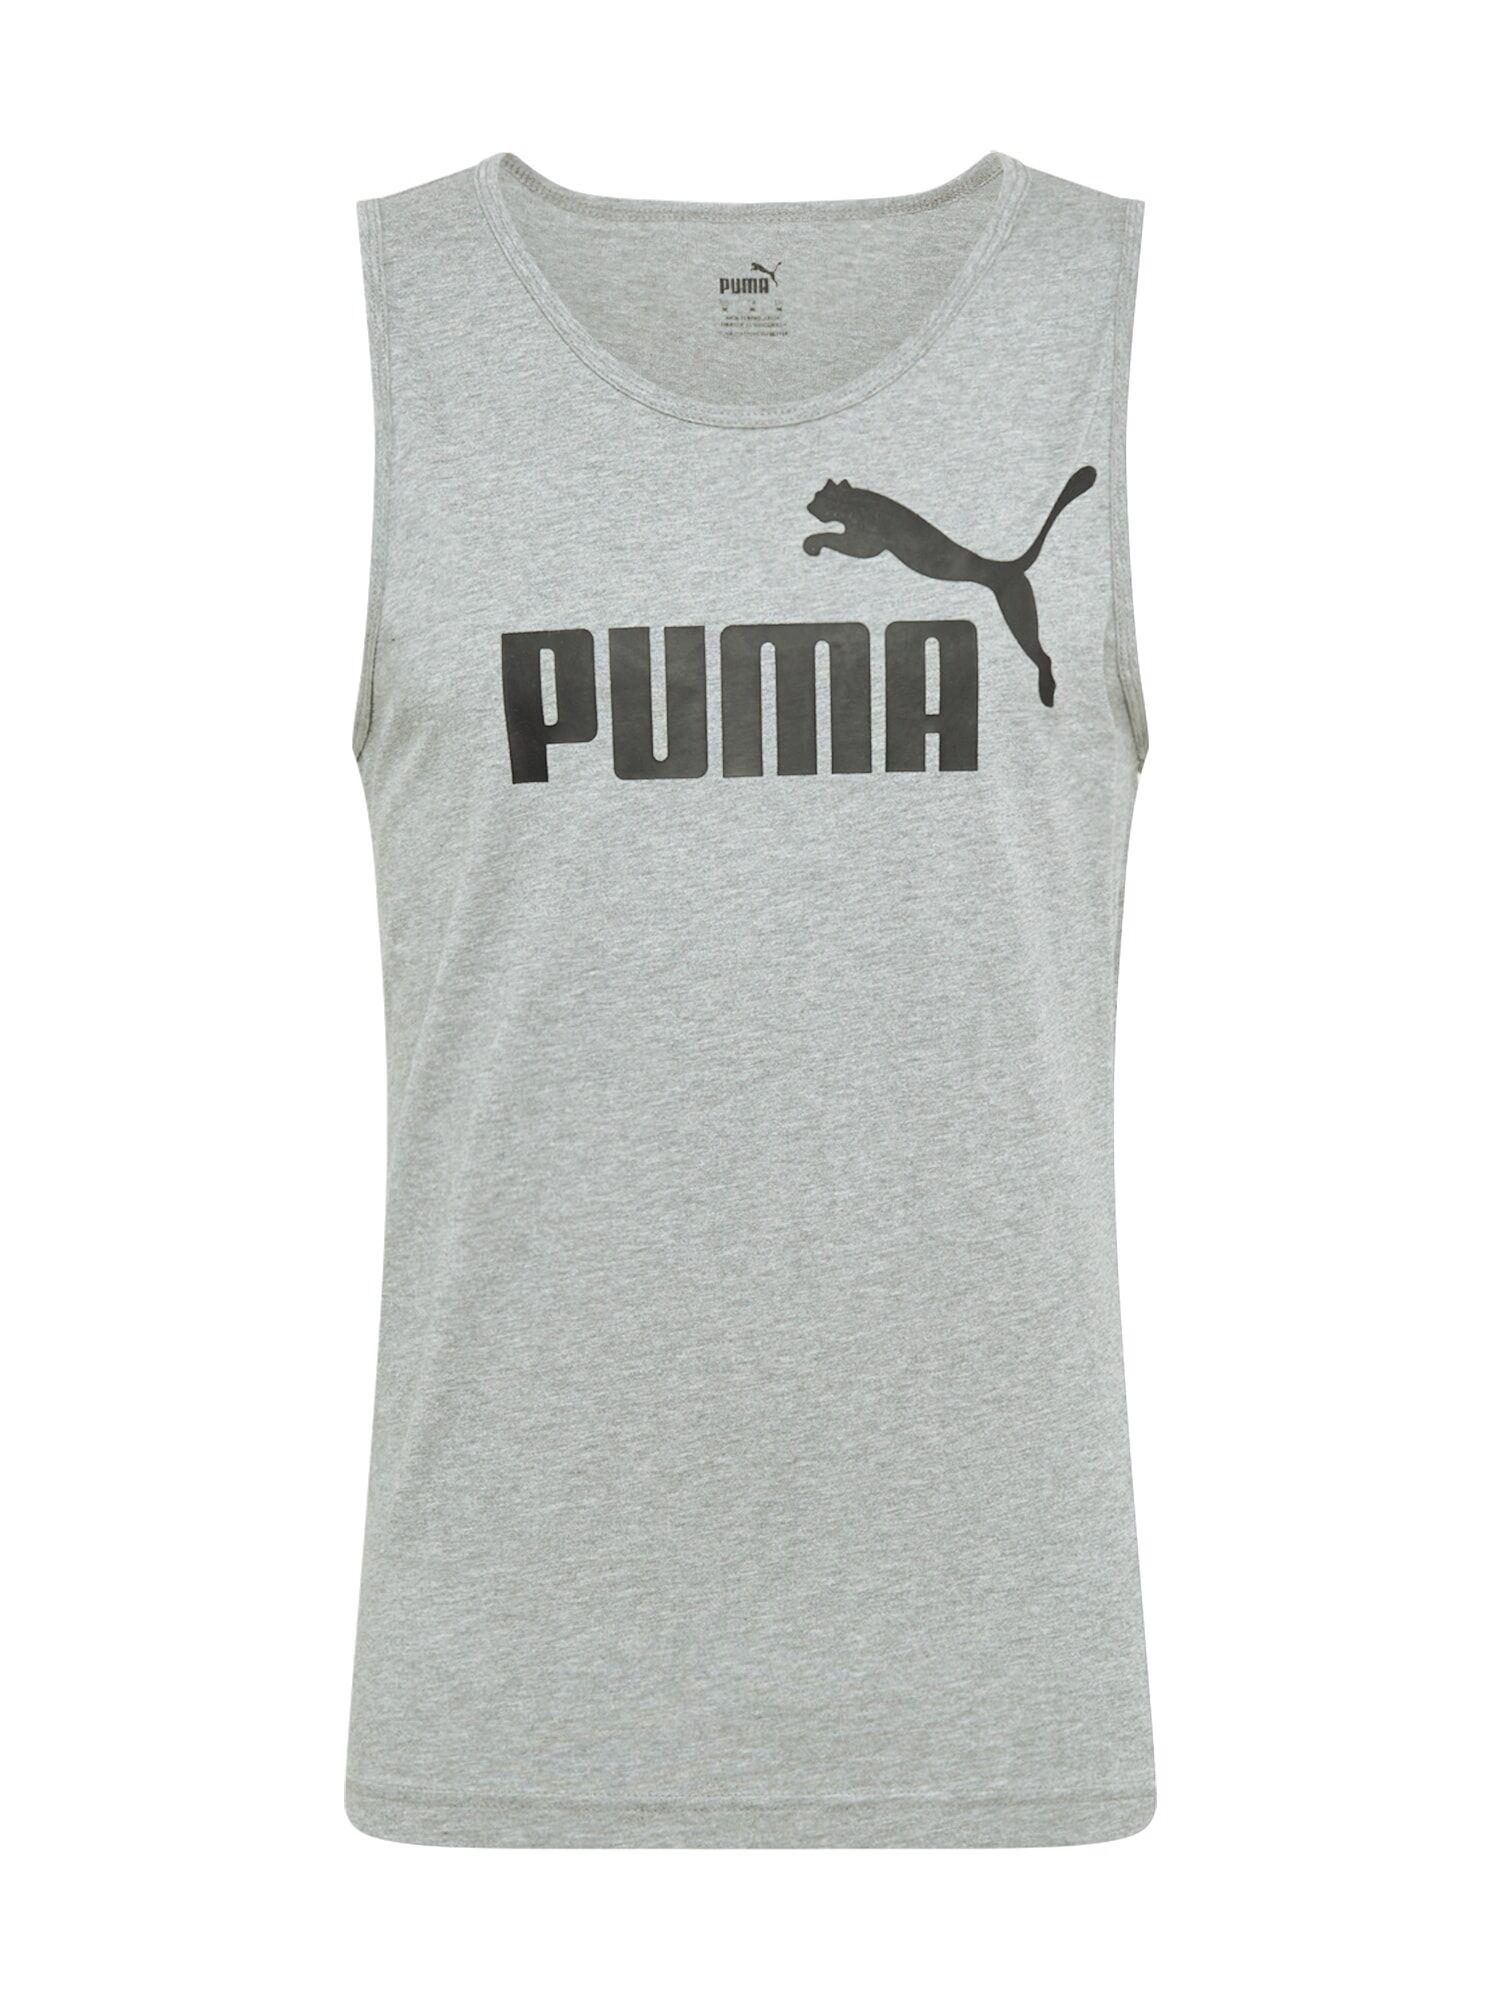 PUMA T-Shirt  - Gris - Taille: M - male